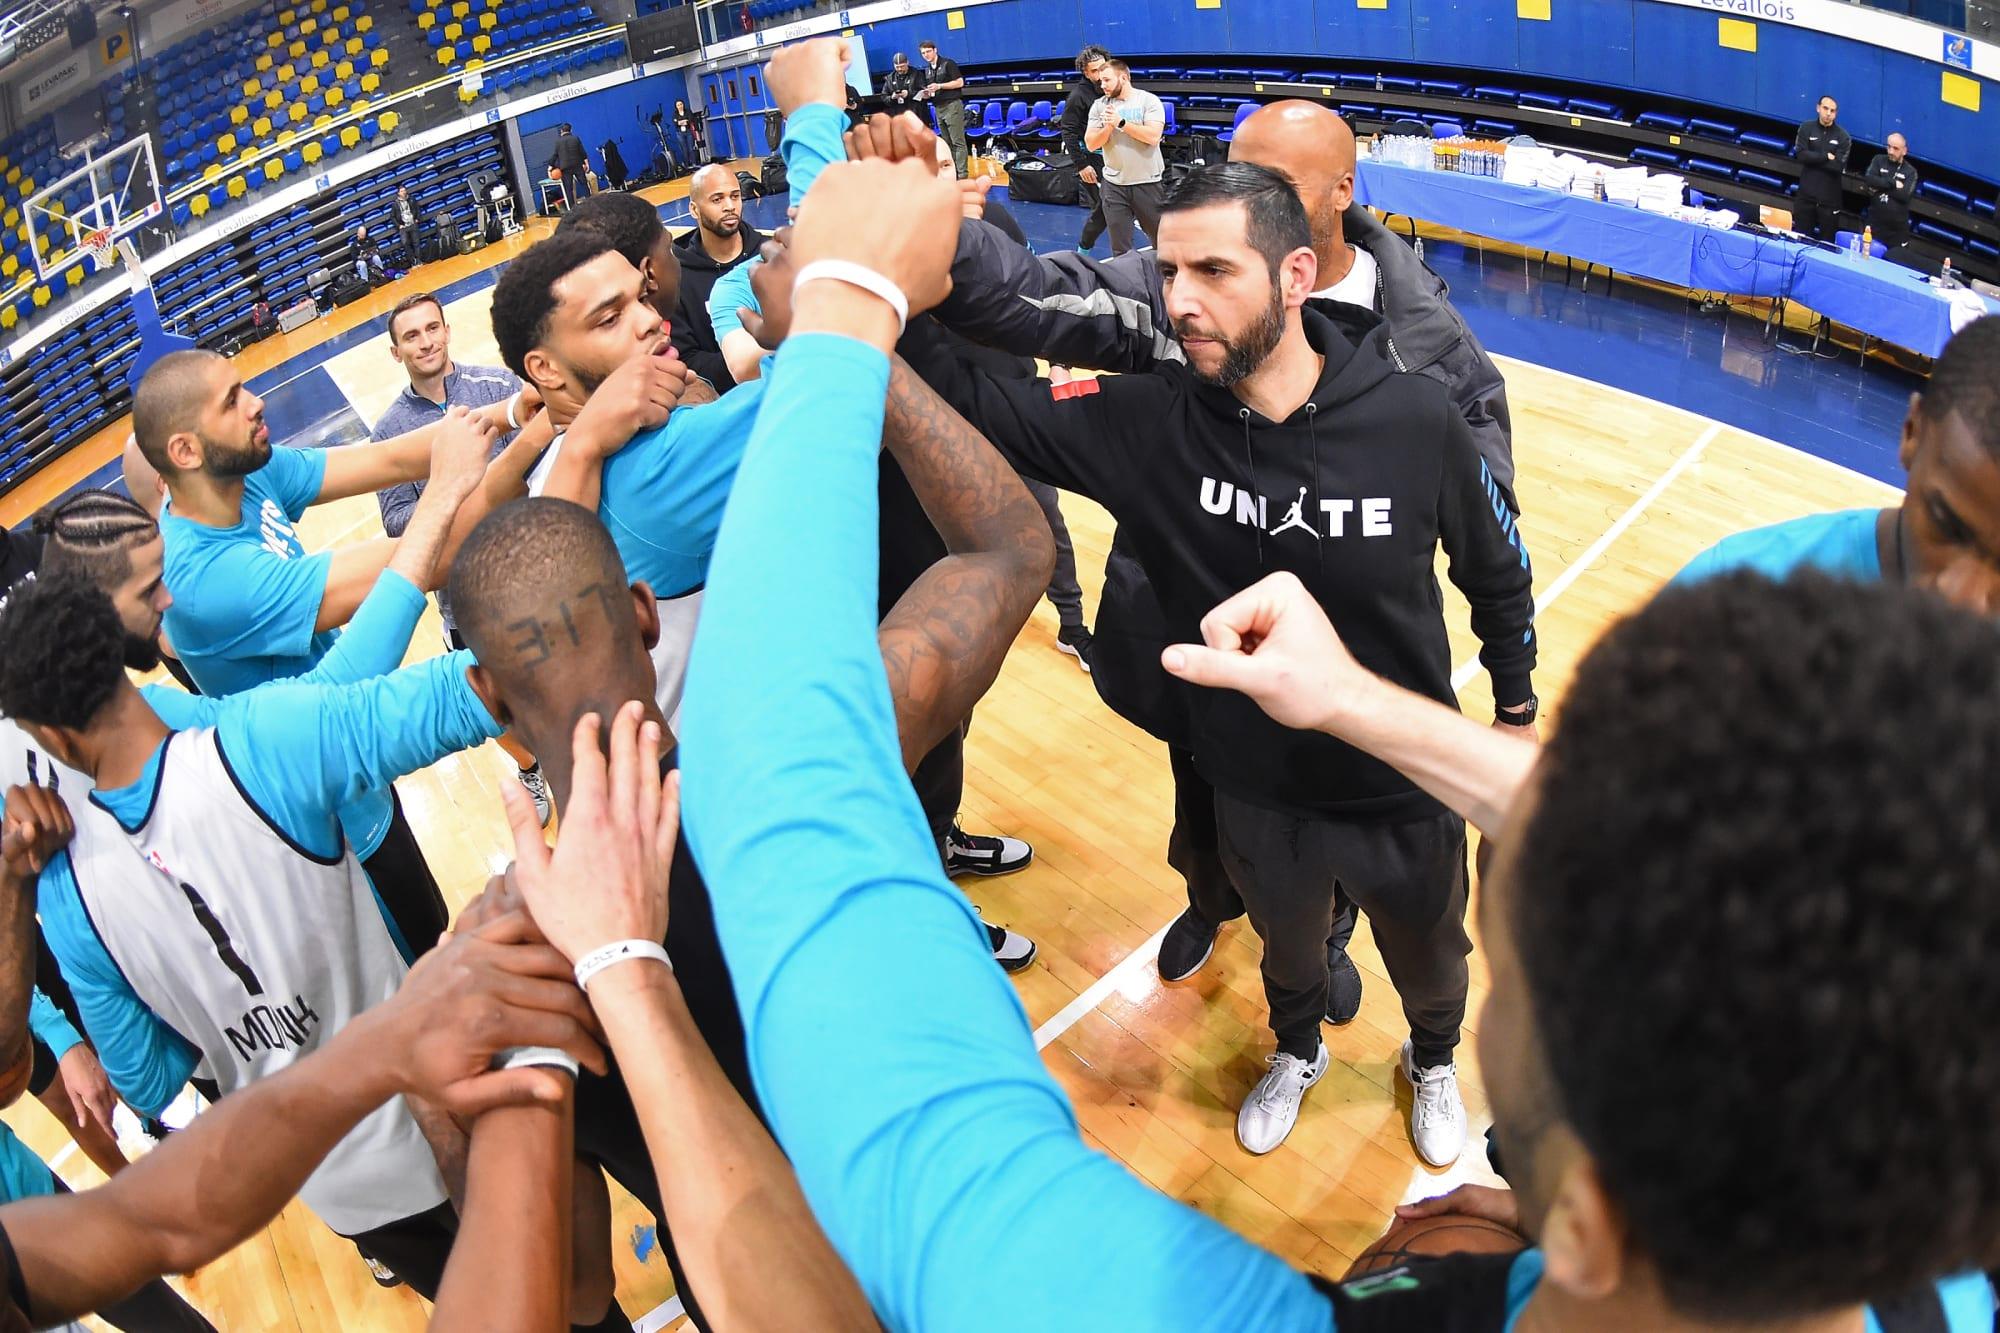 Charlotte Hornets: Renewed season goals